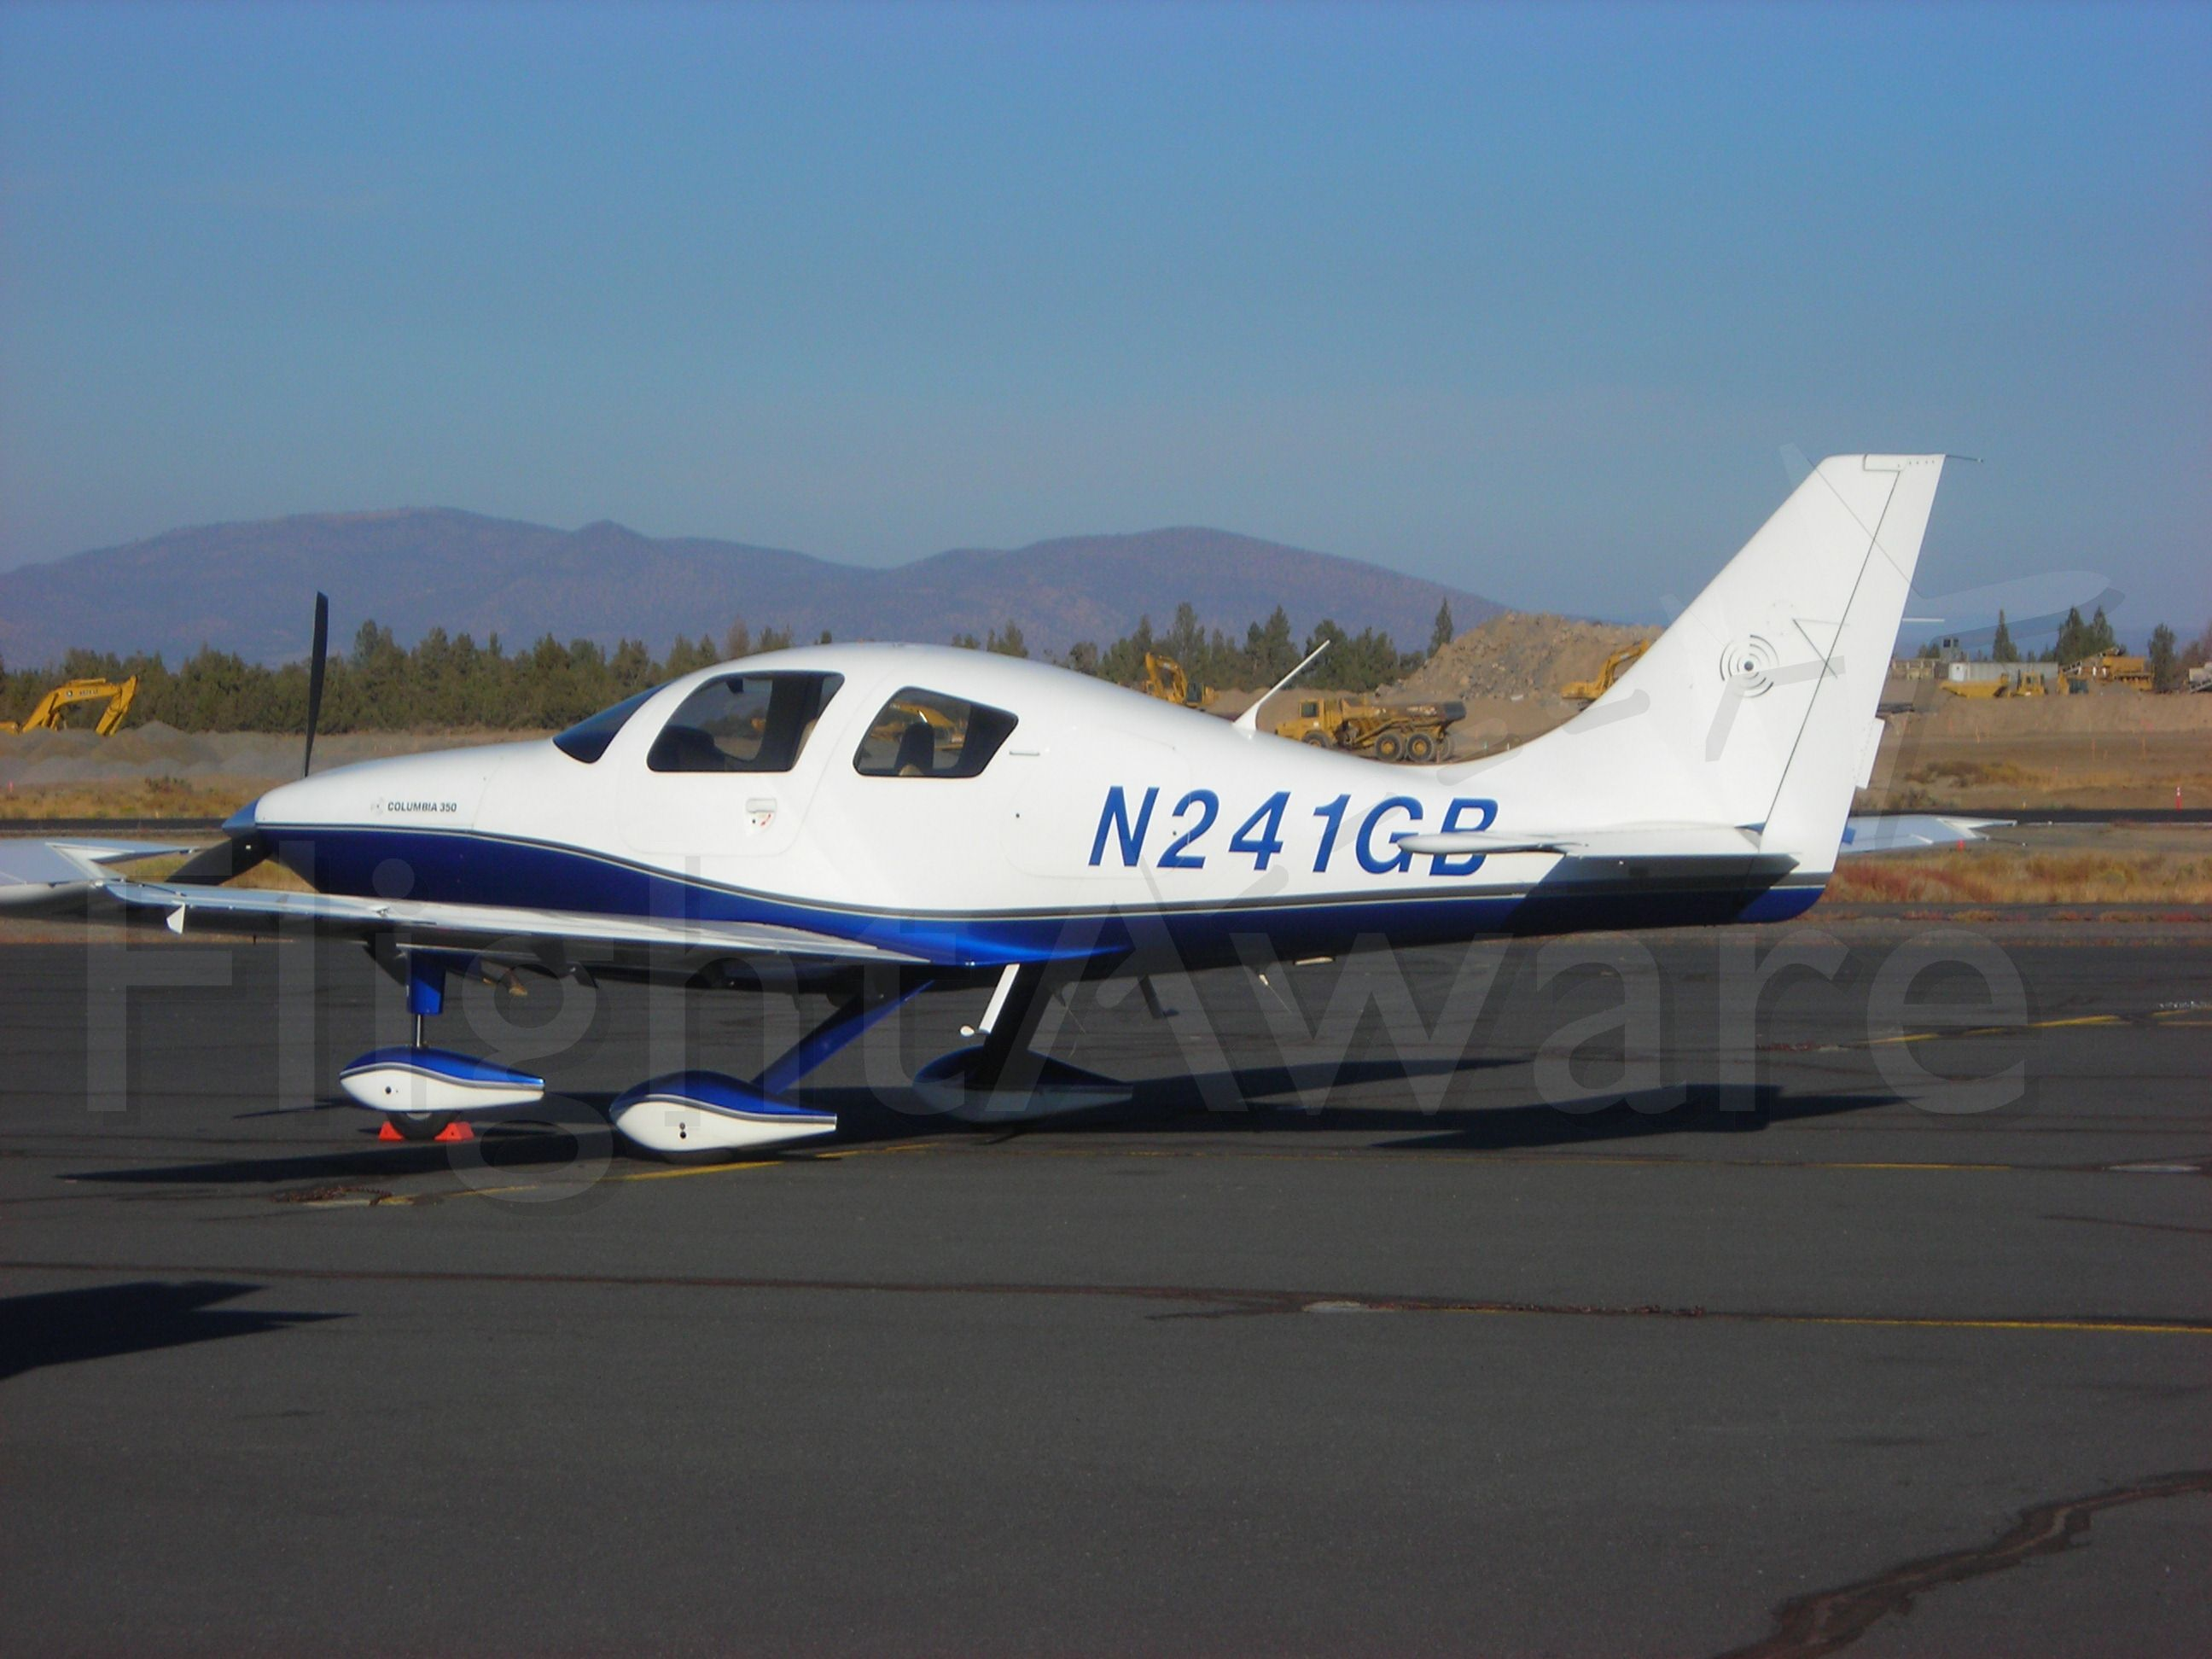 Cessna 400 (N241GB) - ON the ramp at KBDN